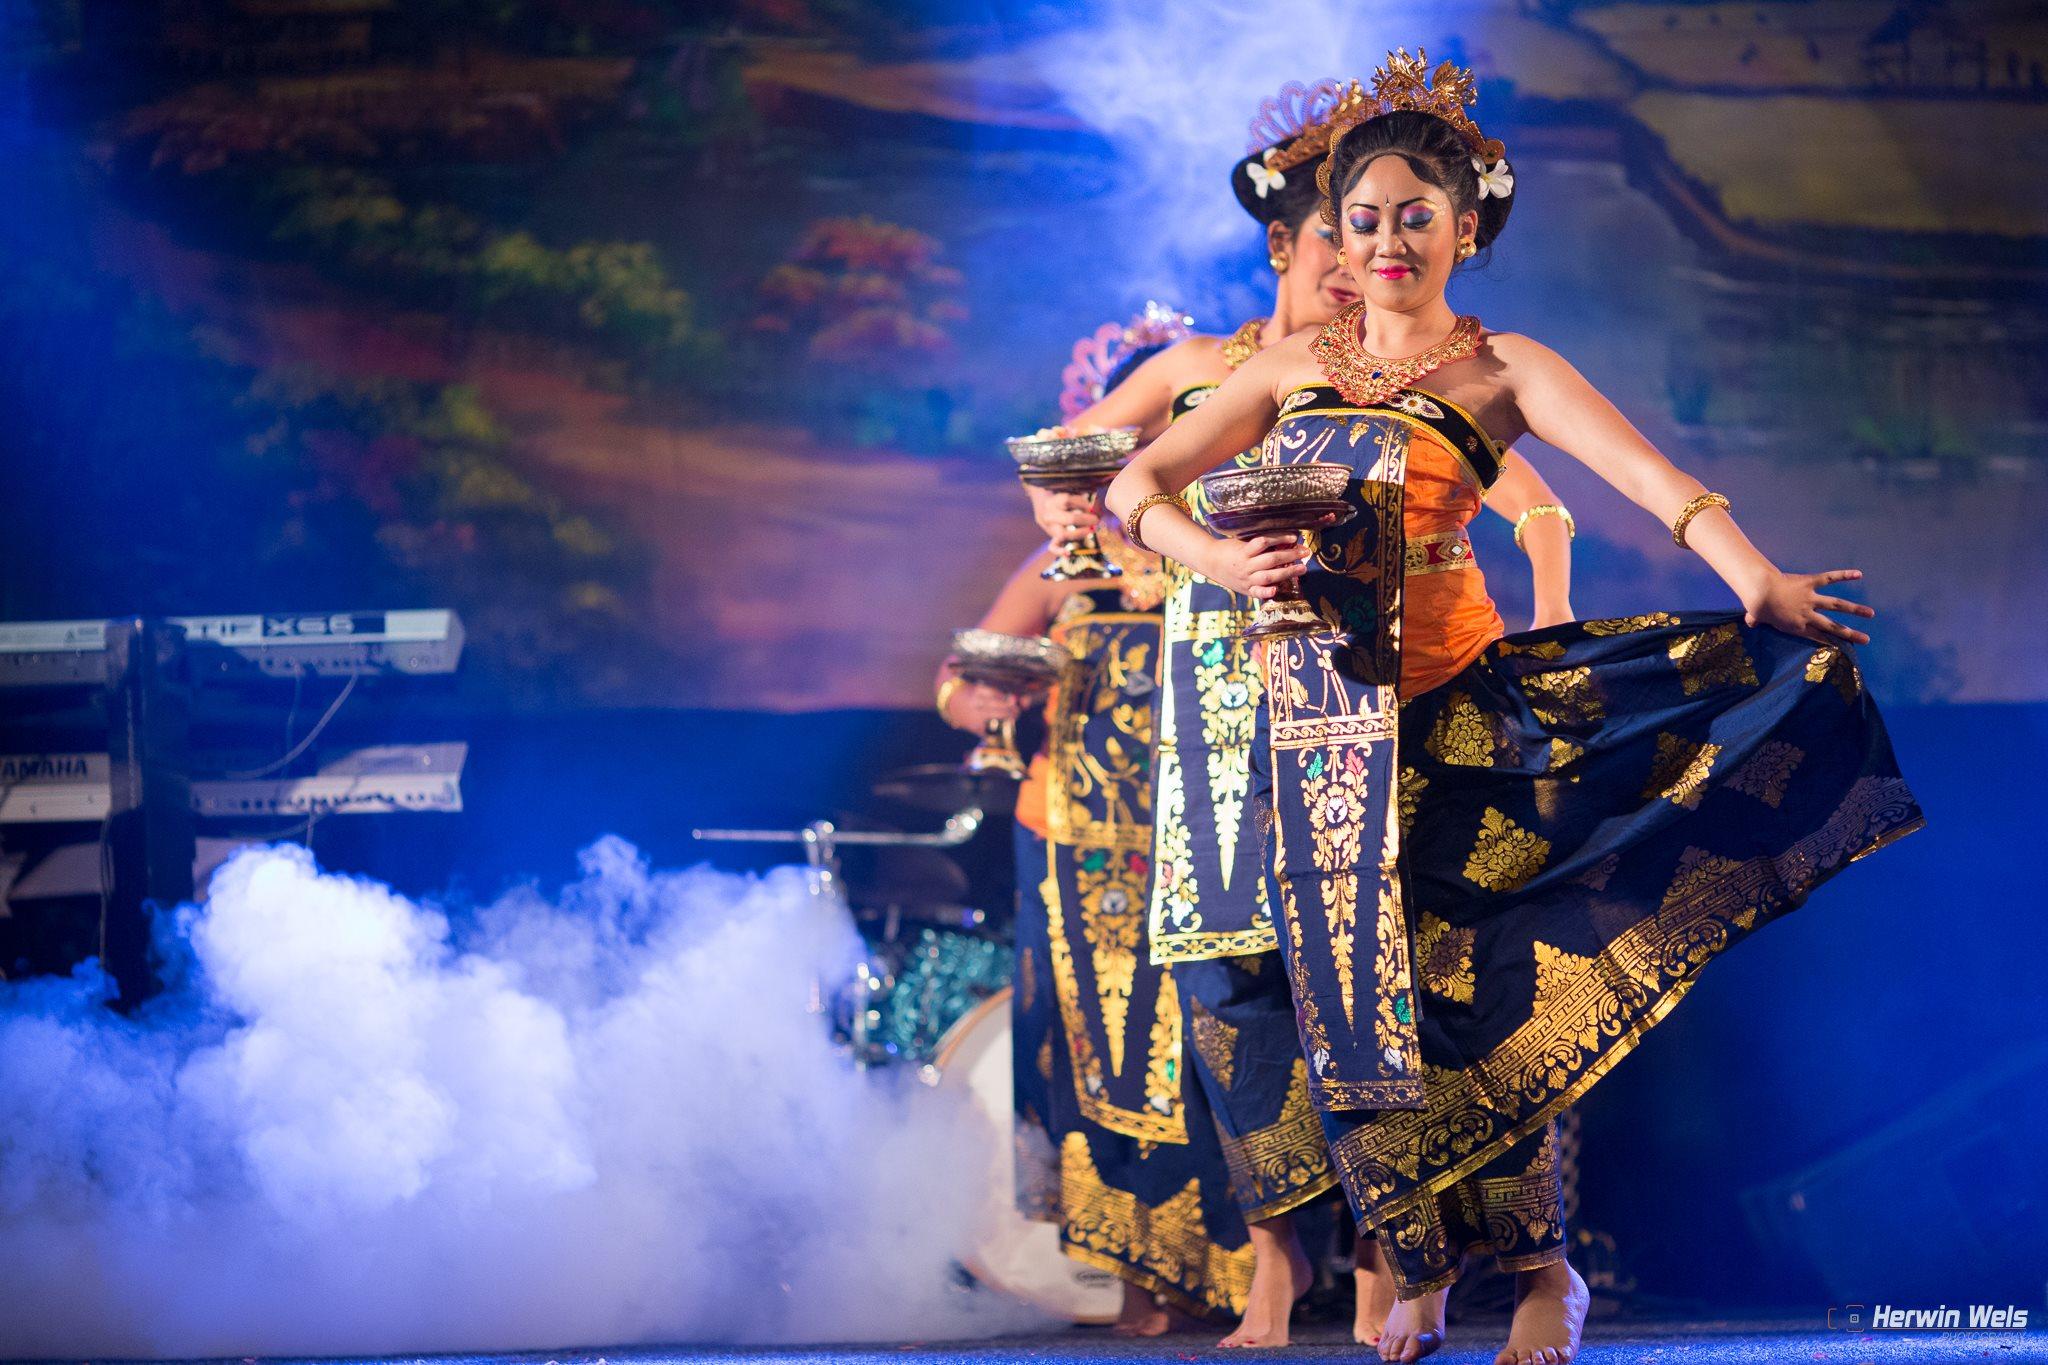 pasar malam rijswijk 2015 balinese dansgroep dwibhumi foto herwin wels